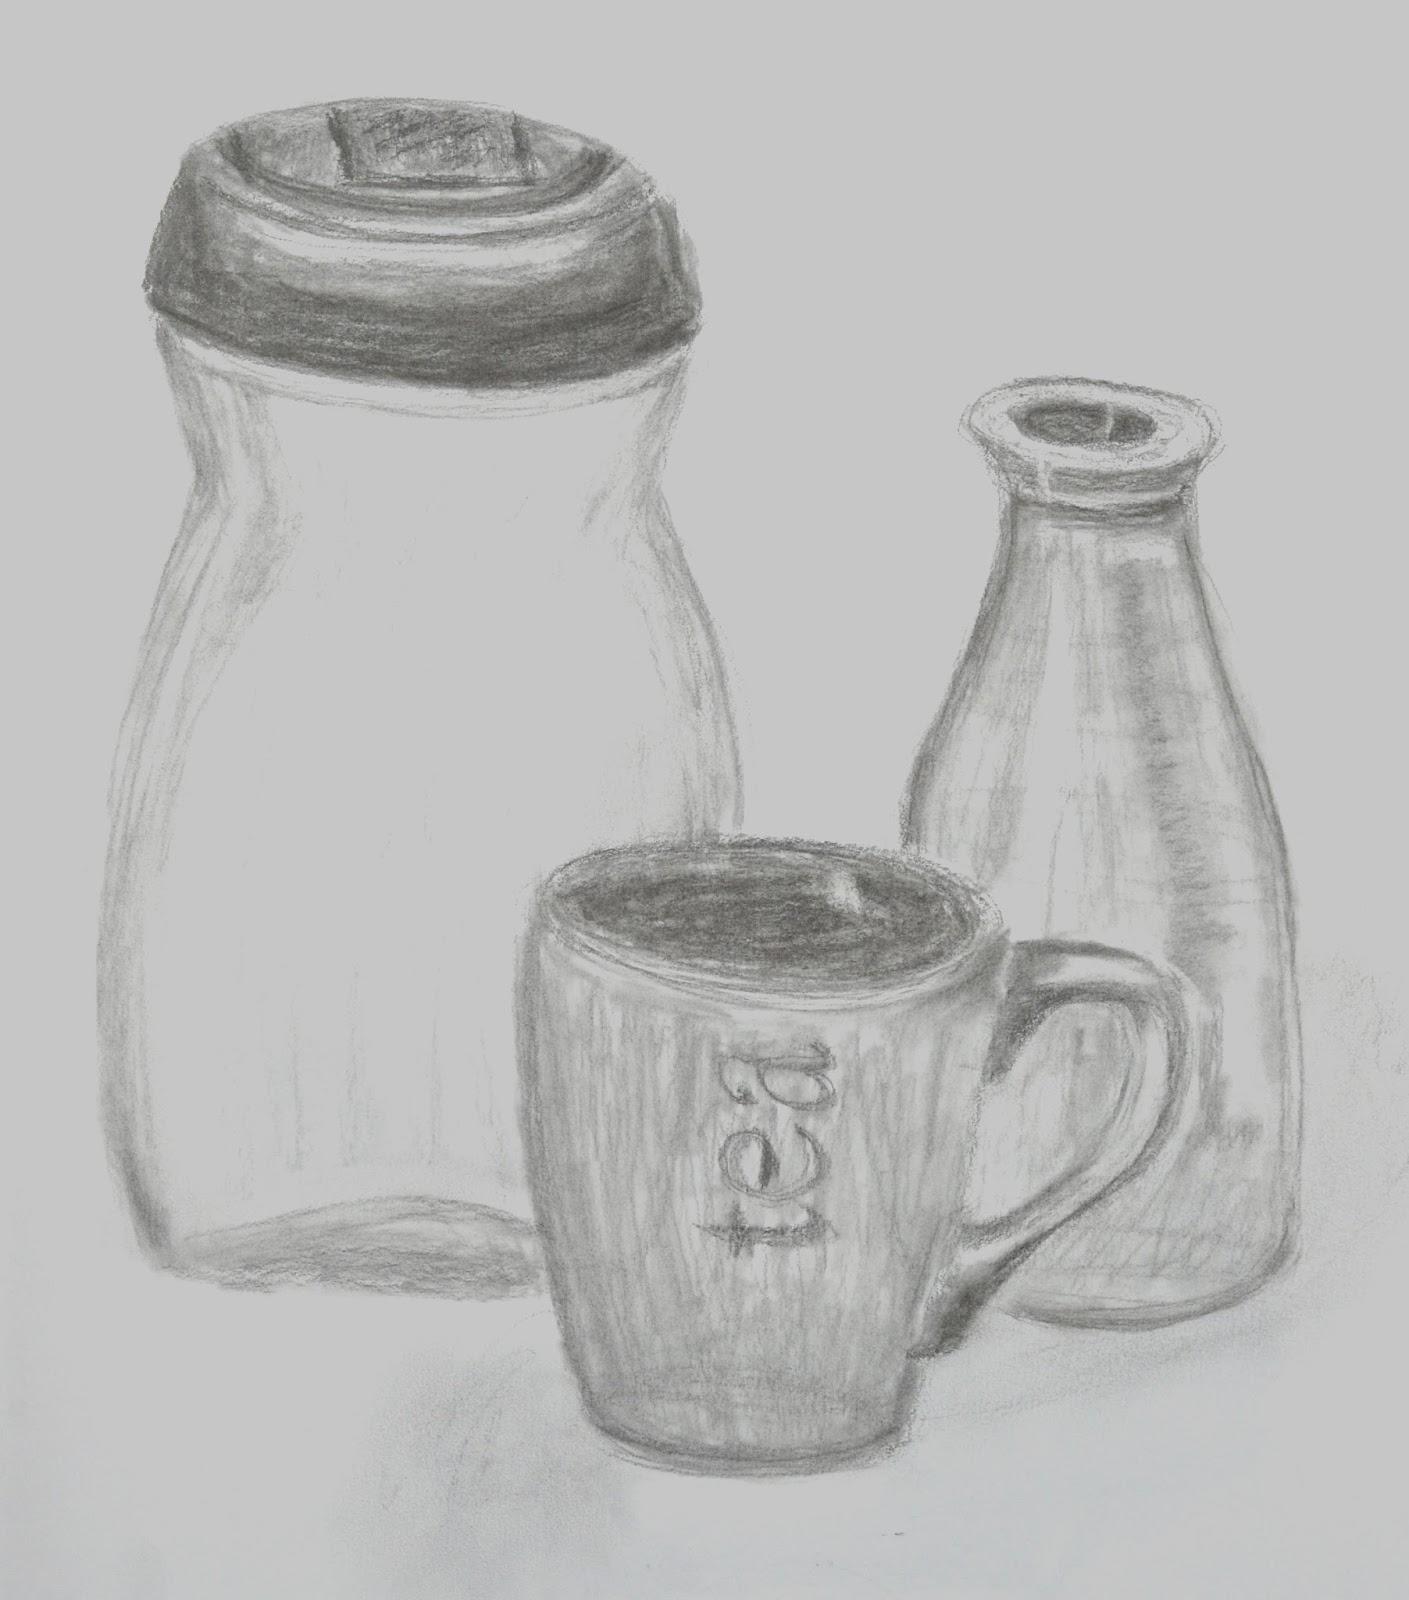 annmariesart: drawing & painting class - line, shape & form w/ joel